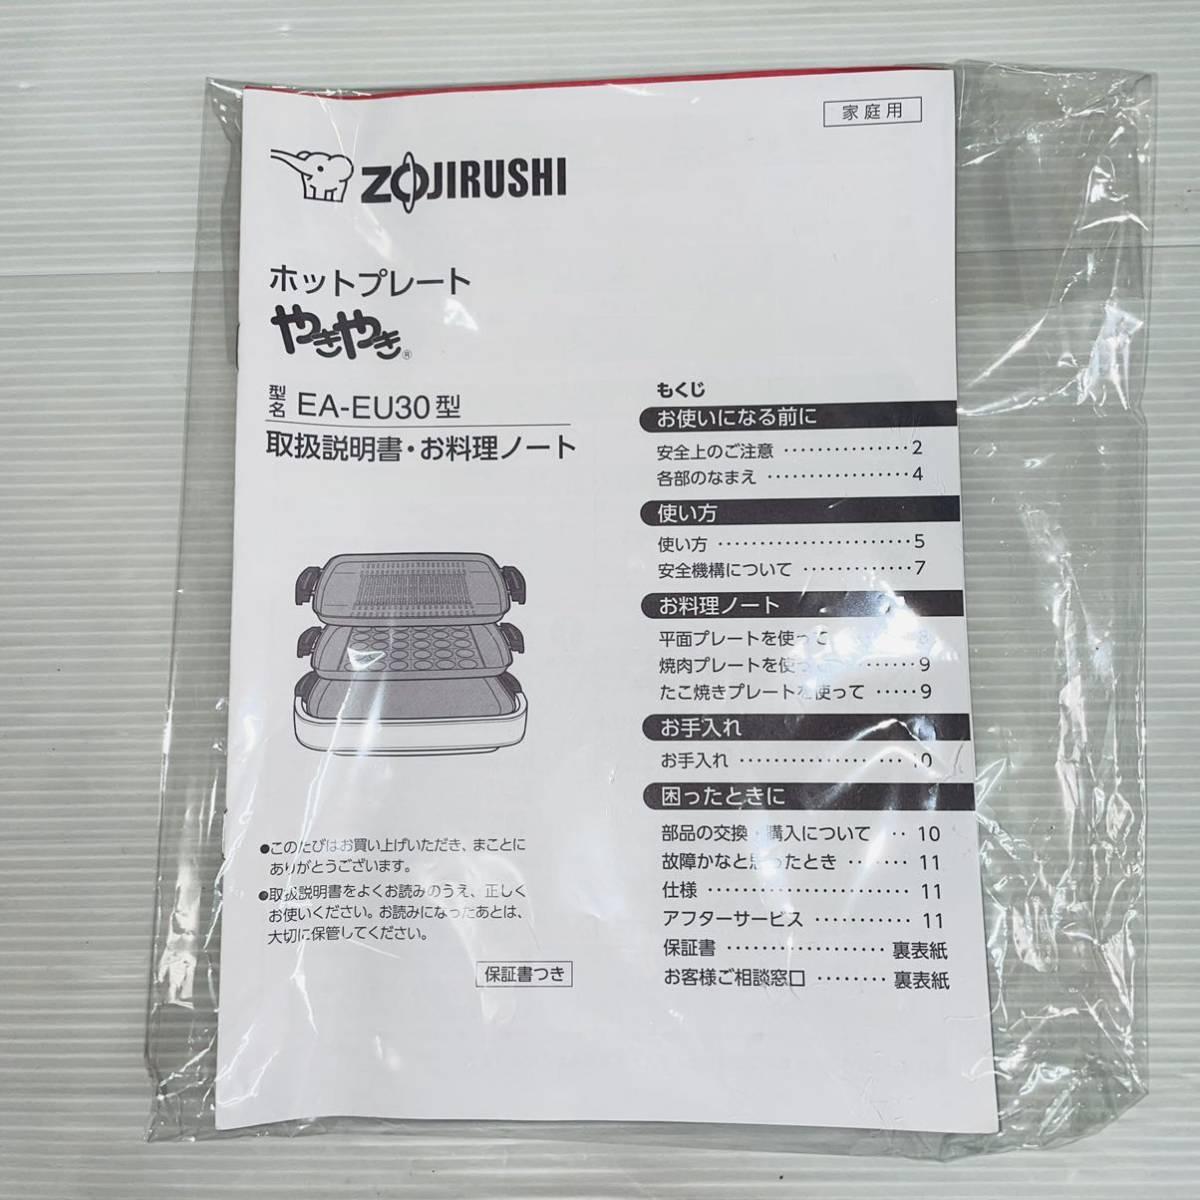 ZOJIRUSHI 象印 EA-EU30 ホットプレート 焼肉プレート たこ焼き タコパ ホットケーキ お好み焼き平面 _画像8